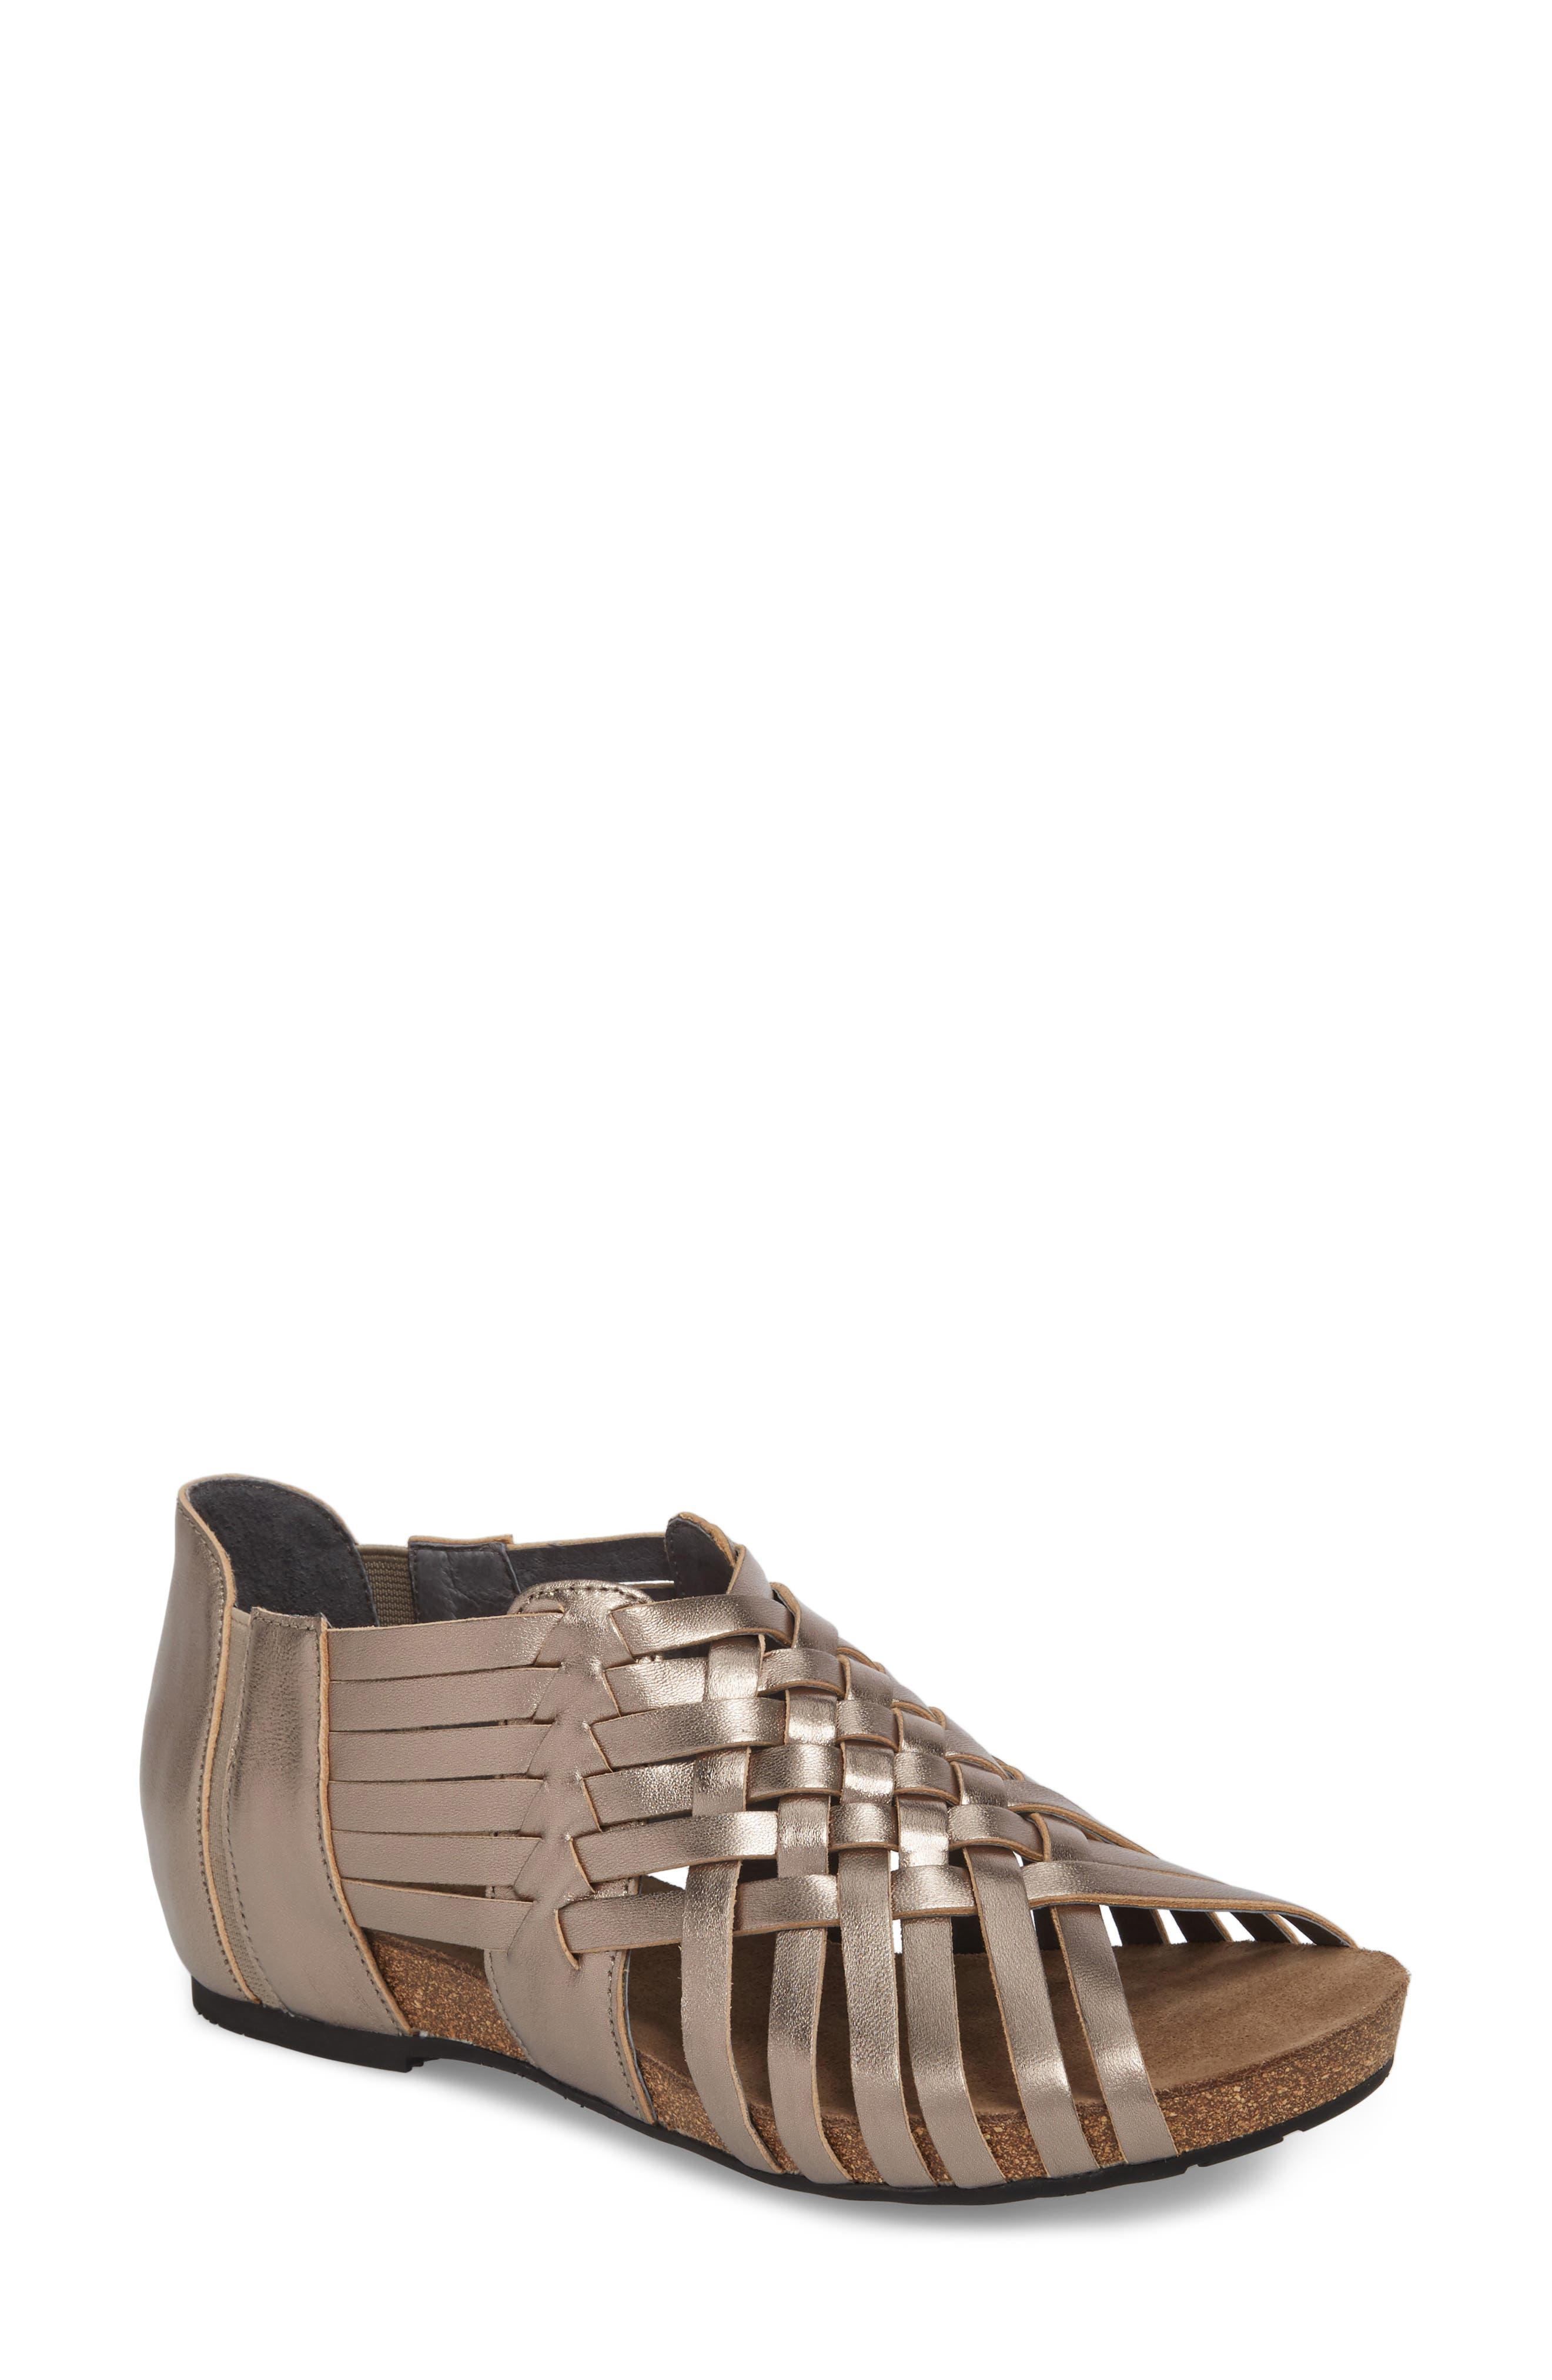 Vivienne Sandal,                         Main,                         color, Gunmetal Leather